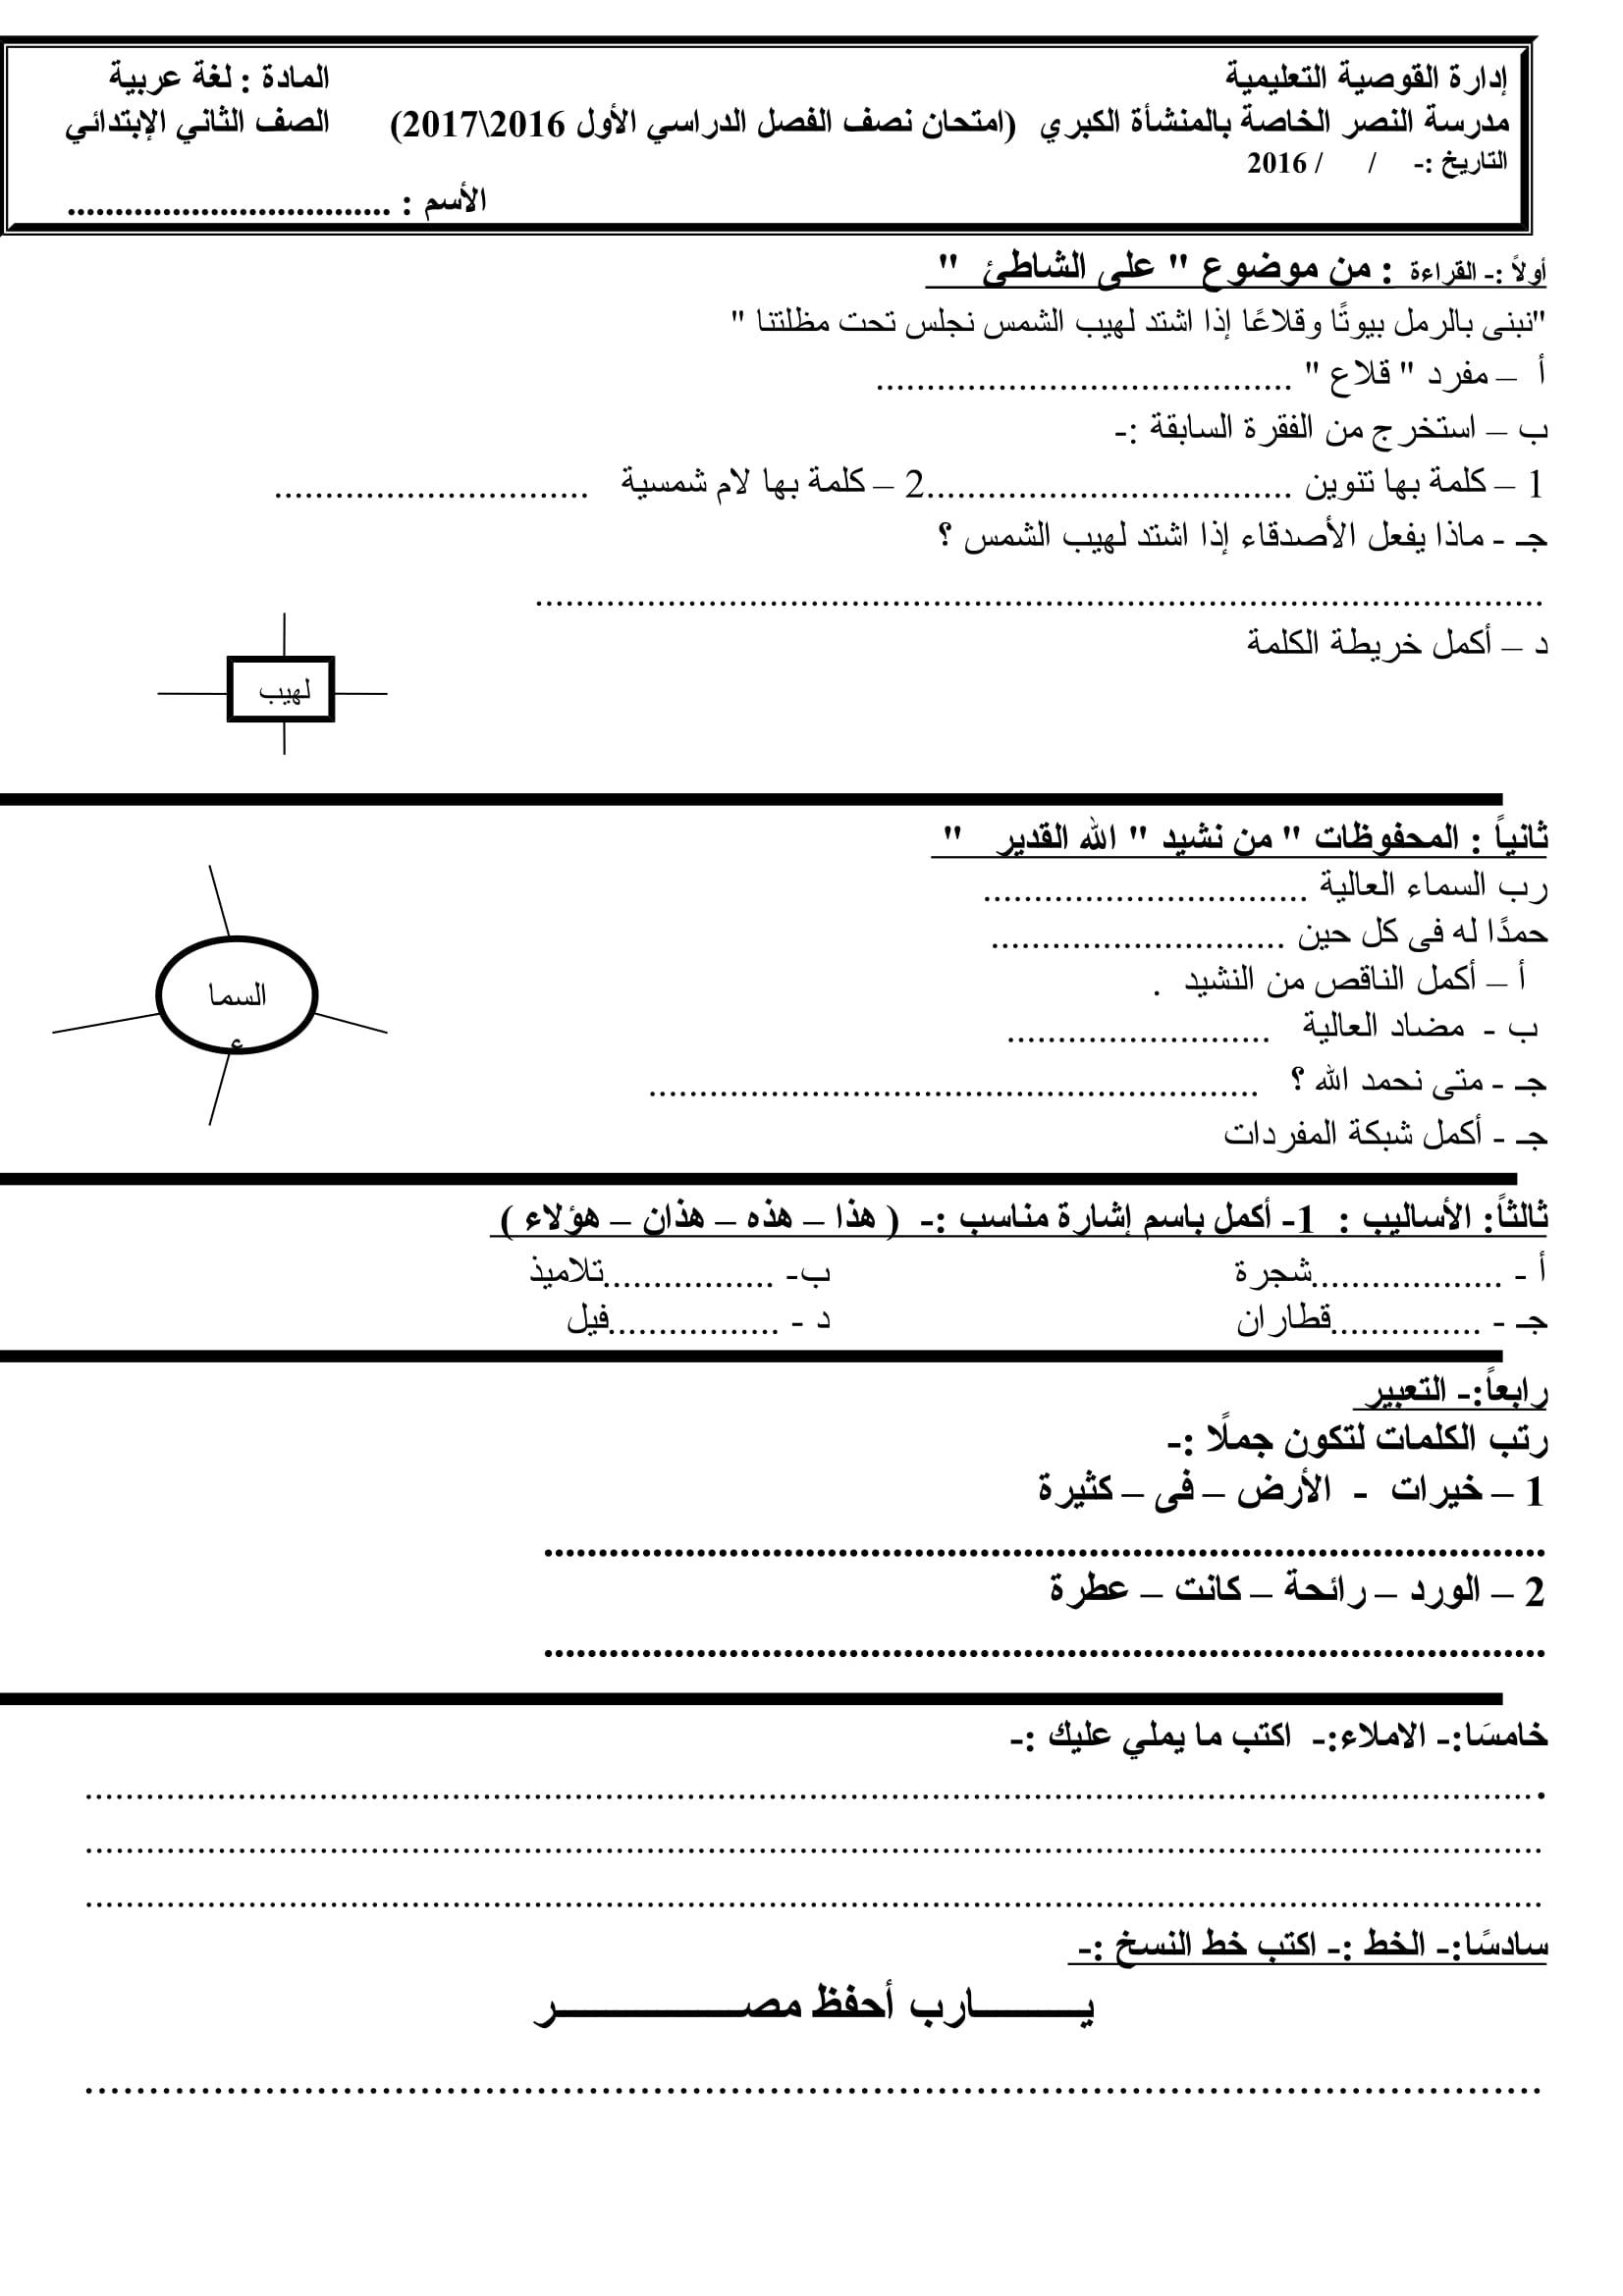 exam-eg.com_148190005491.jpg